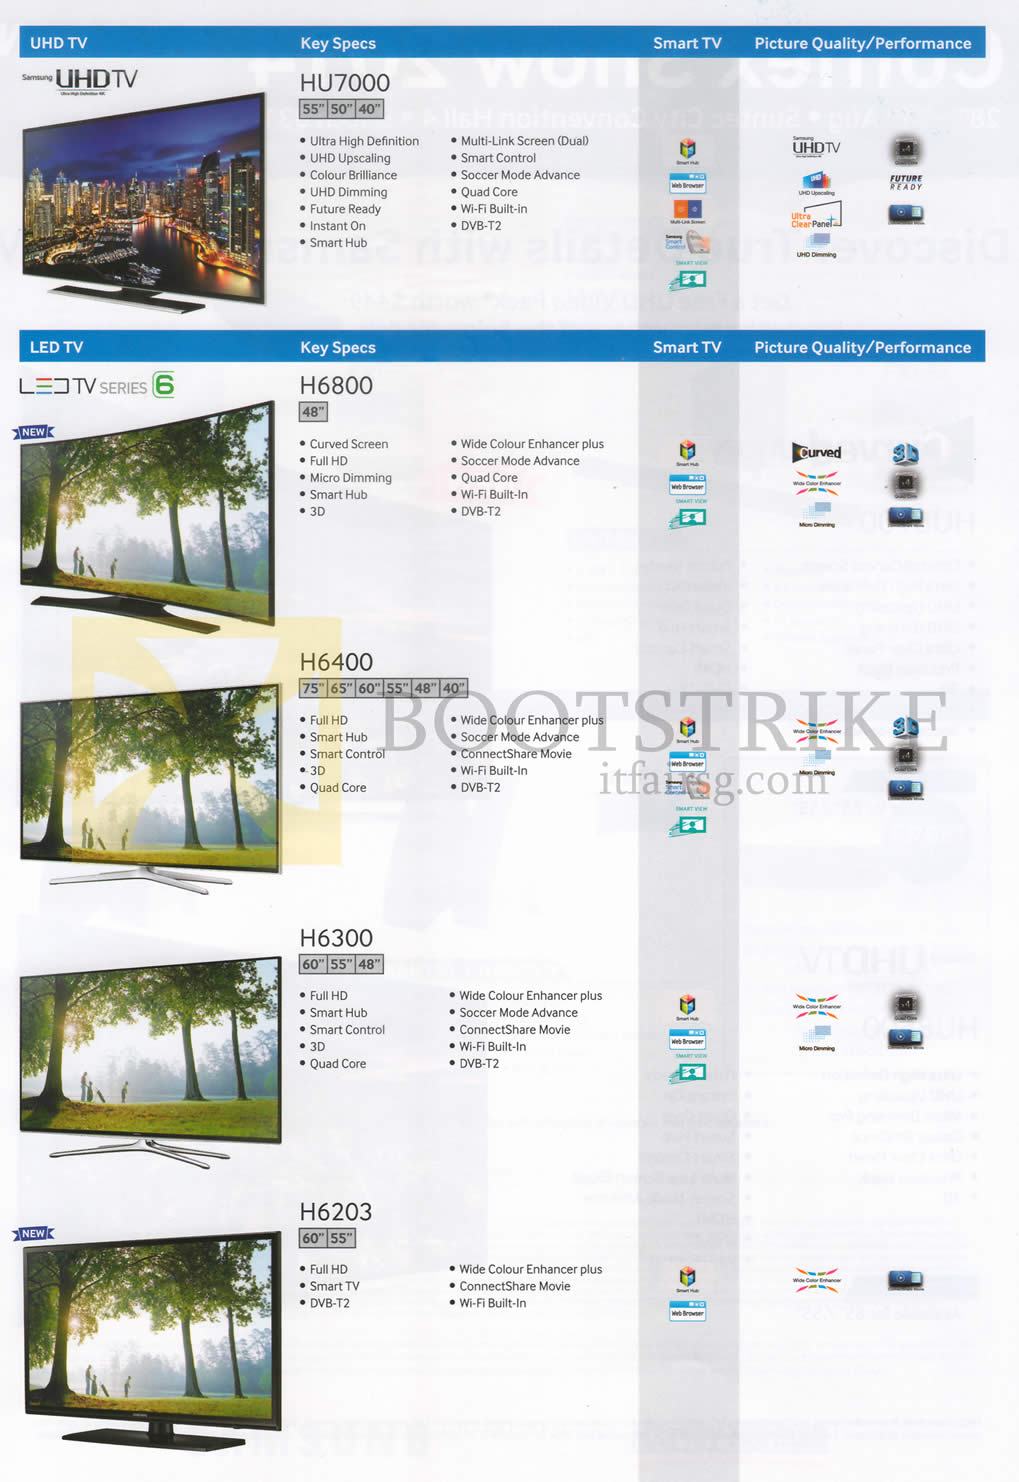 COMEX 2014 price list image brochure of Samsung TVs (No Prices) HU7000, H6800, H6400, H6300, H6203